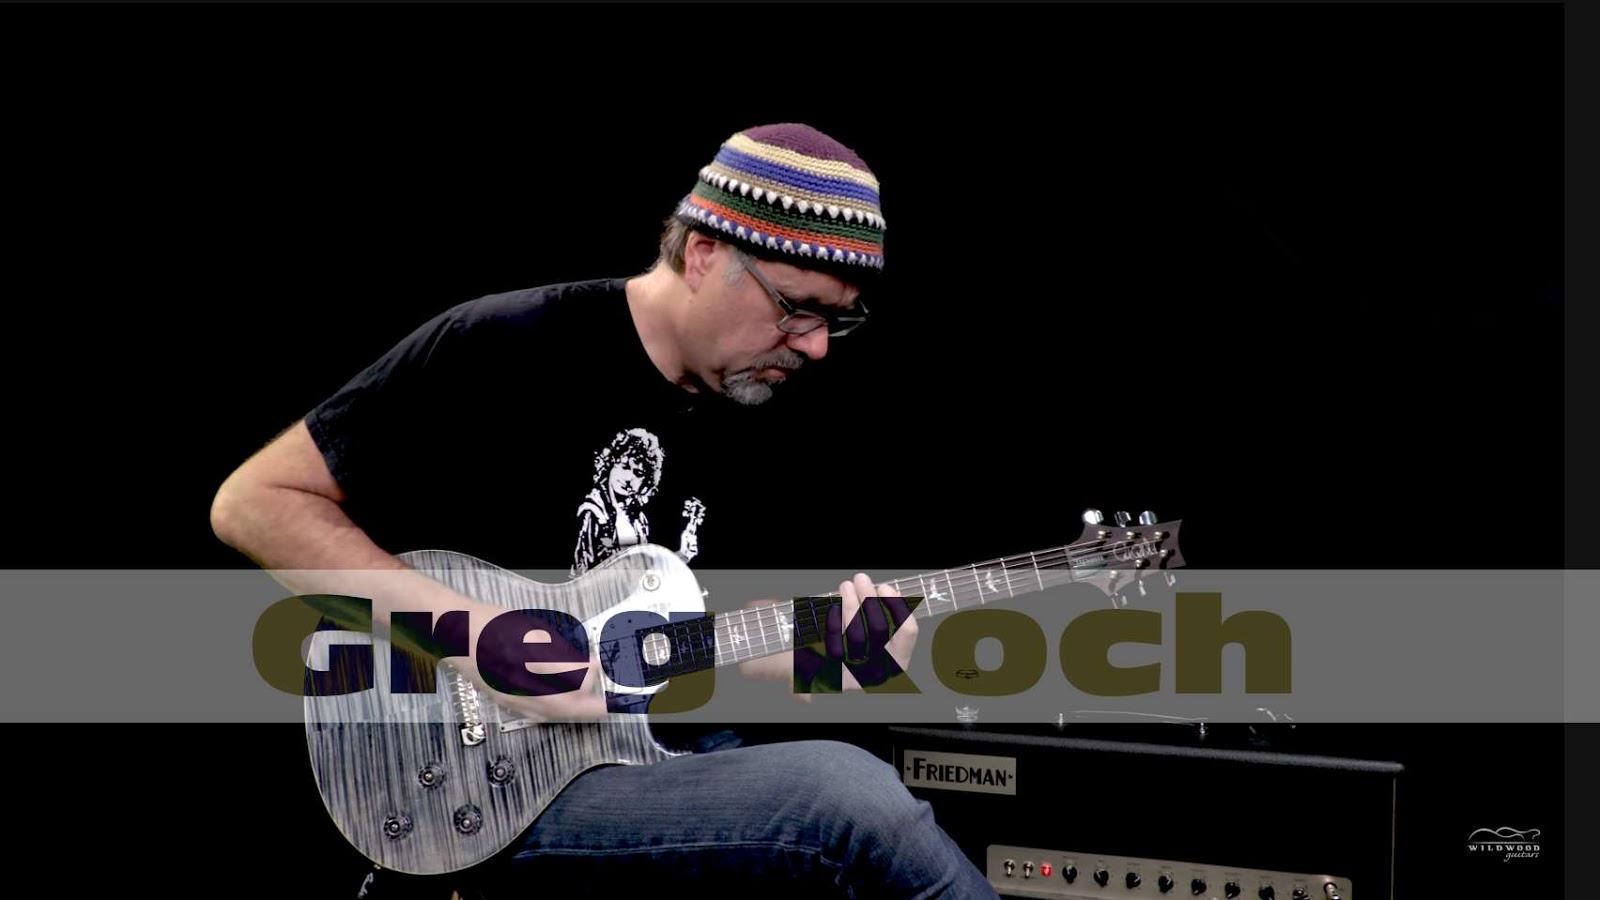 greg koch prs guitars limited edition mark tremonti baritone. Black Bedroom Furniture Sets. Home Design Ideas